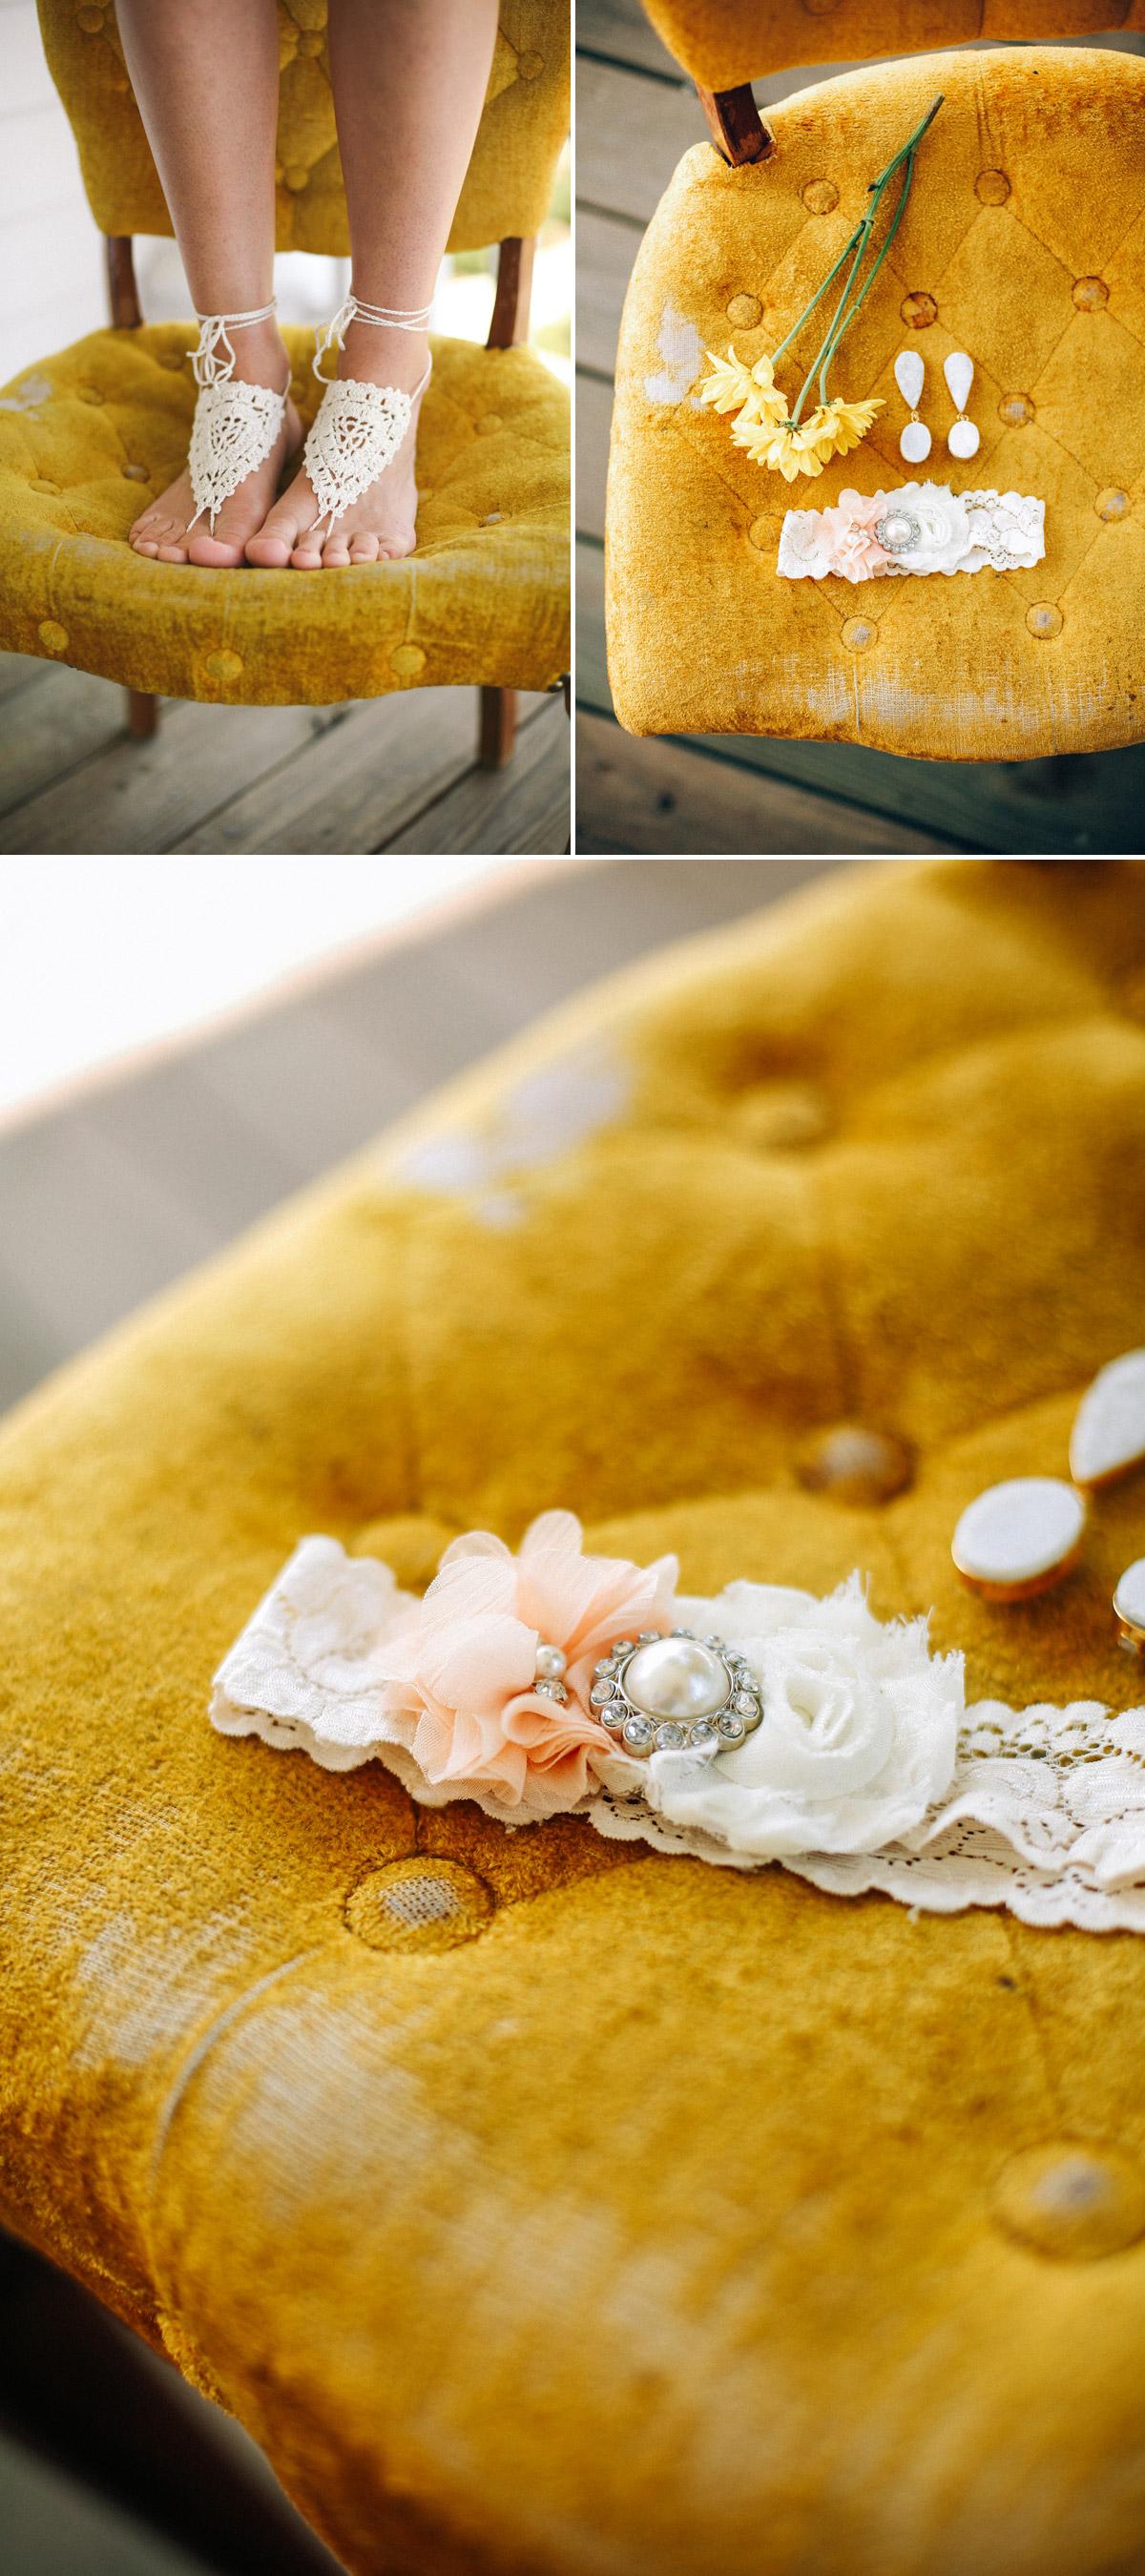 Blog-Collage-1401685836760.jpg